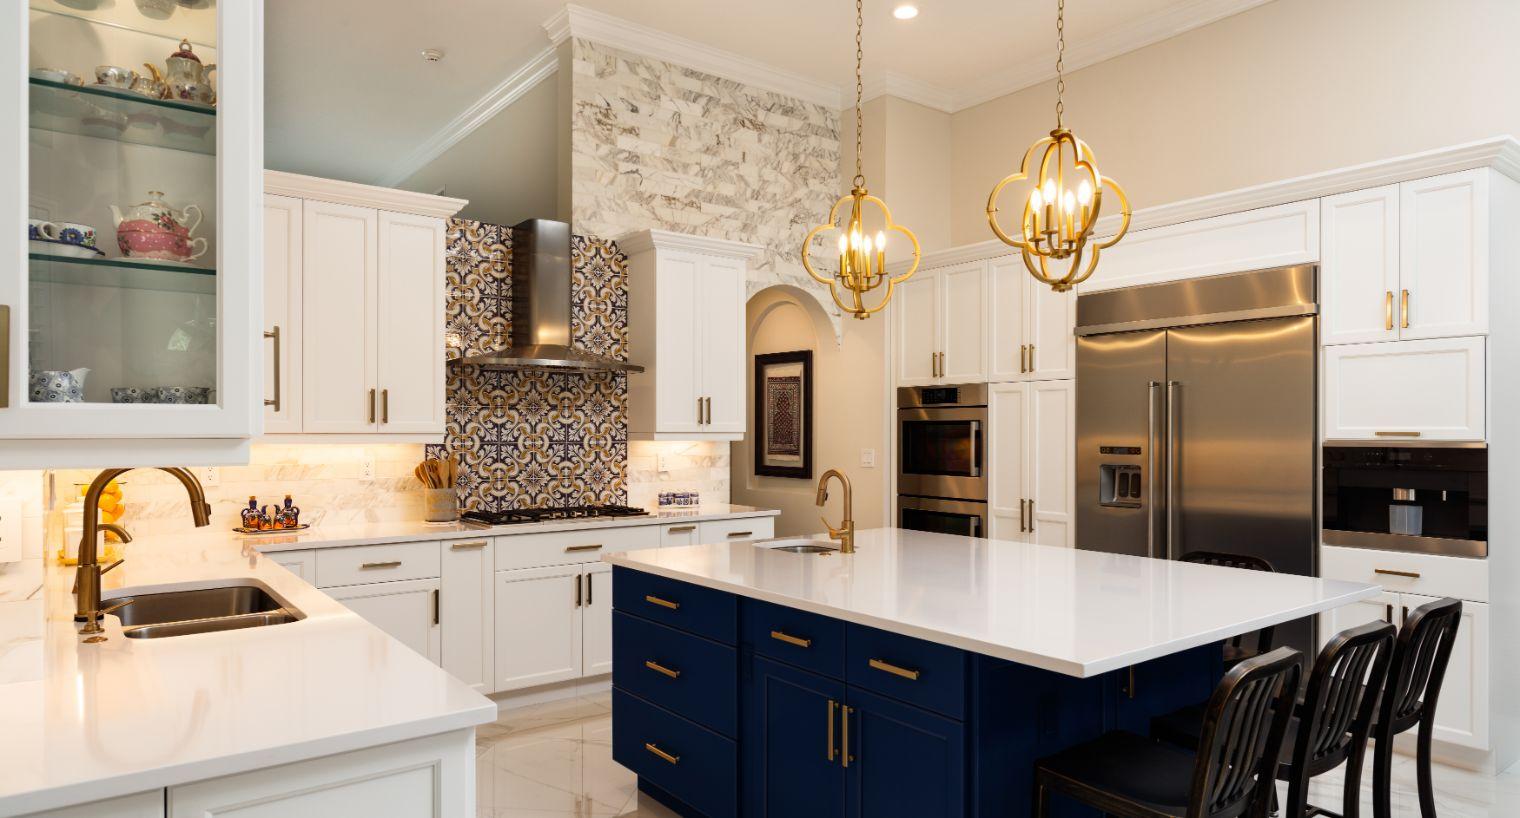 6 best colorado home insurance